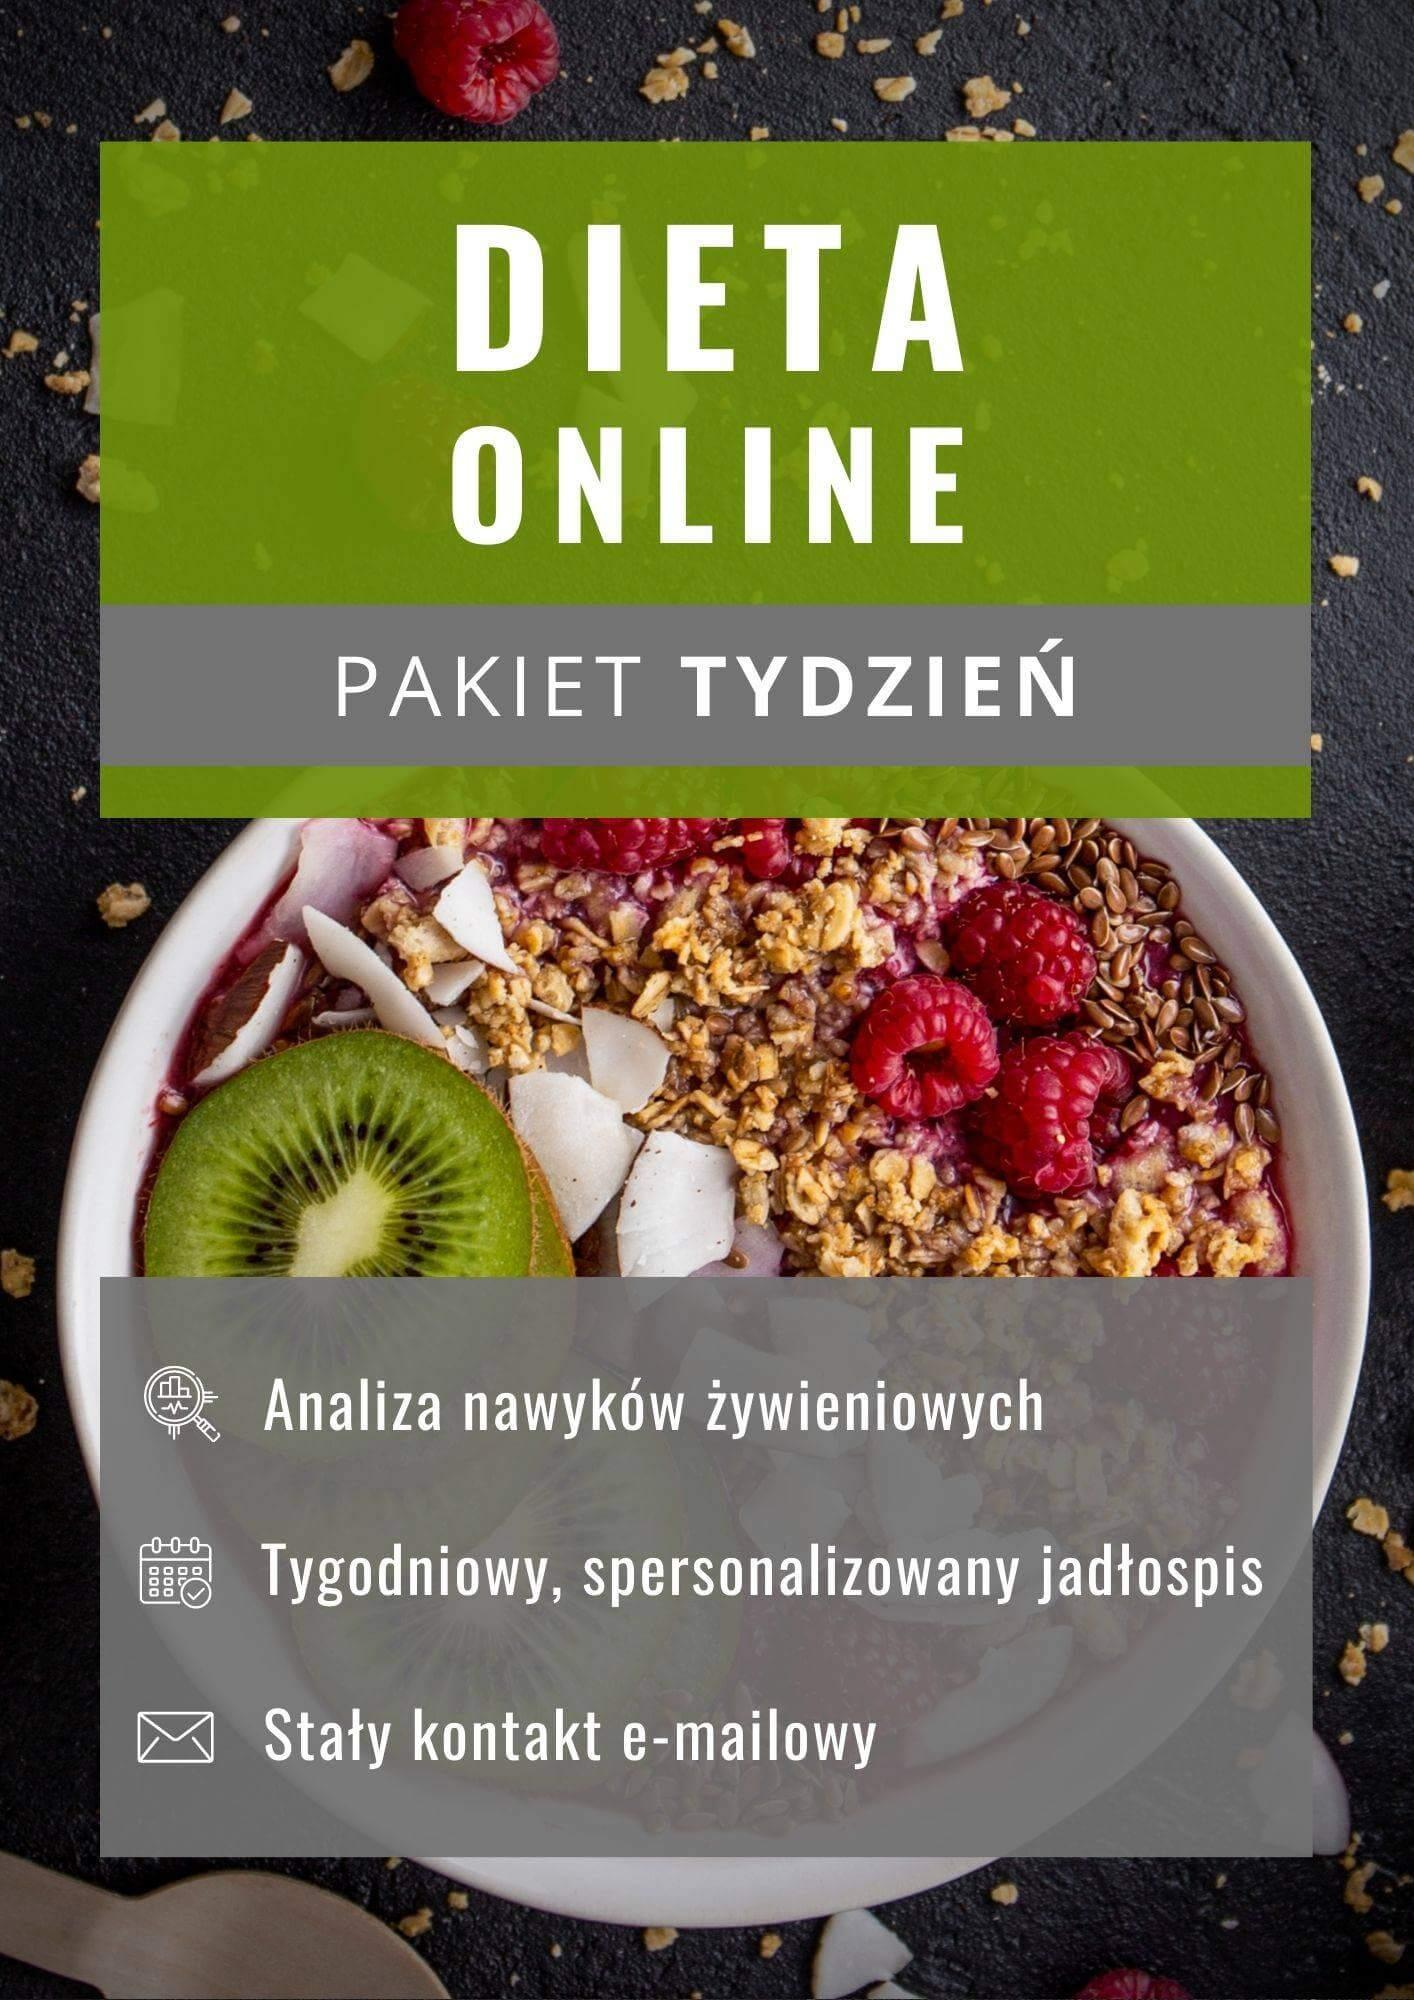 Dieta online - pakiet tydzień